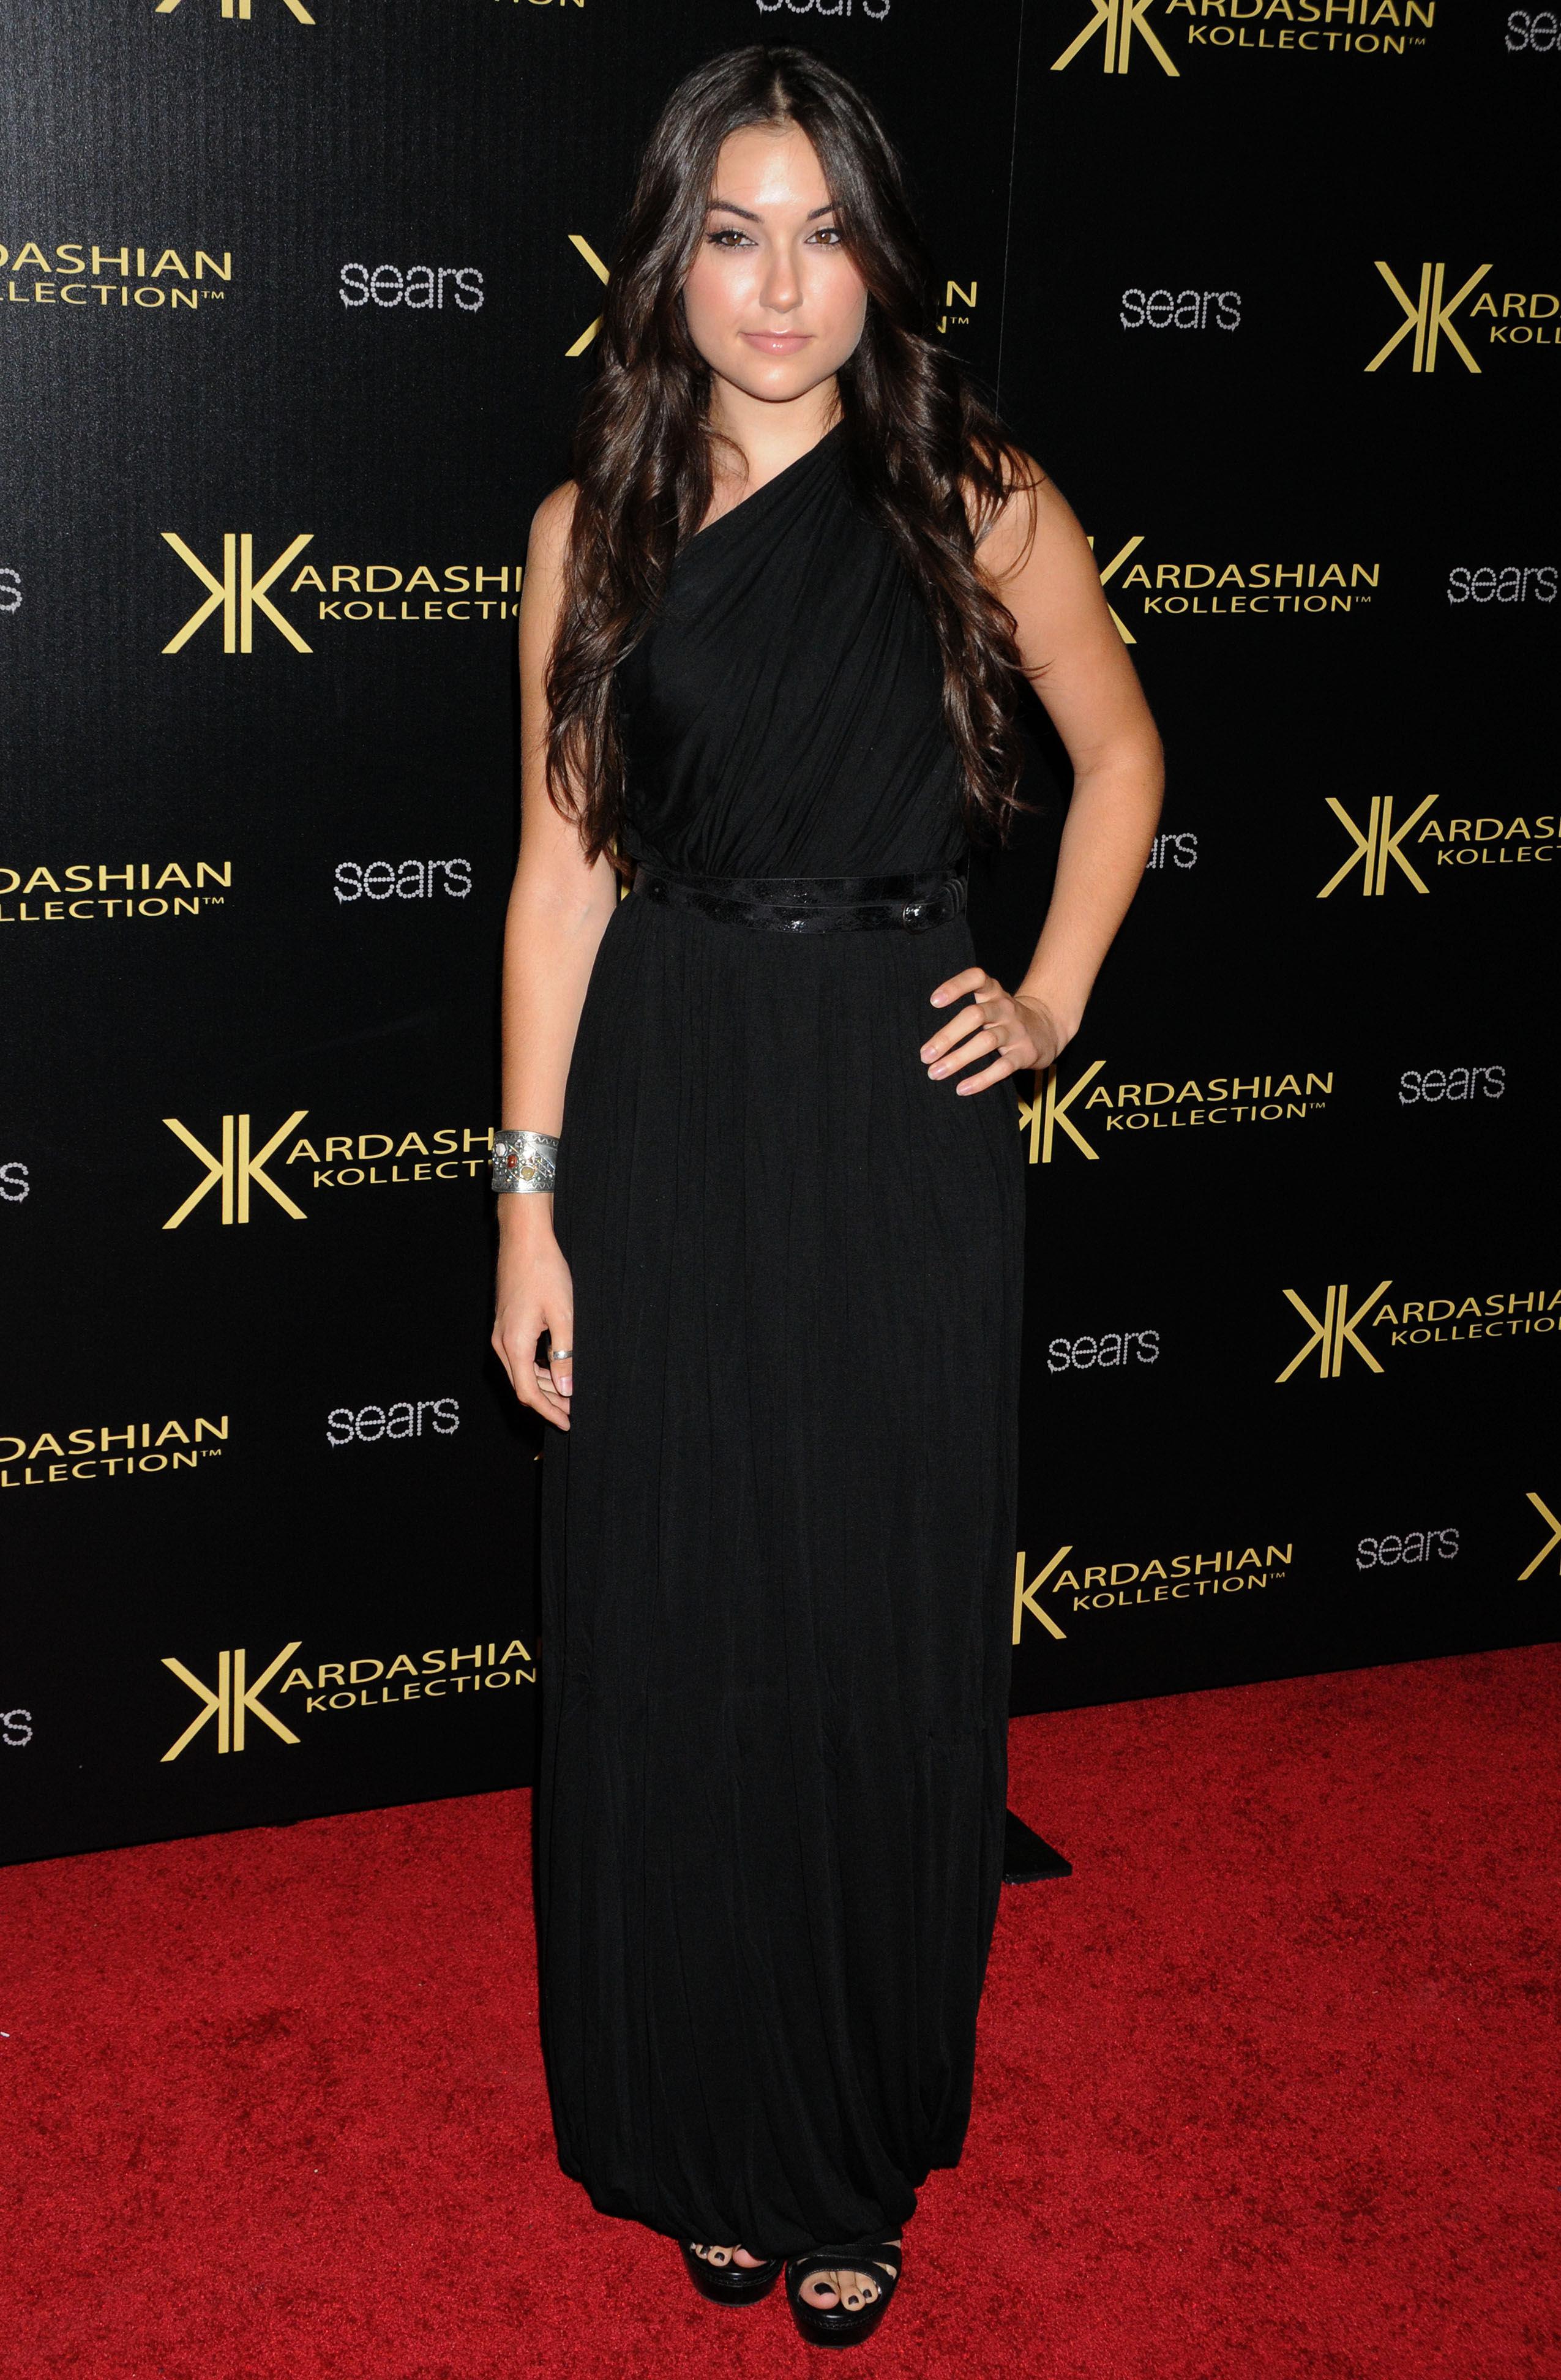 Sasha Grey Wear Black Long Dress At Kardashian Kollection